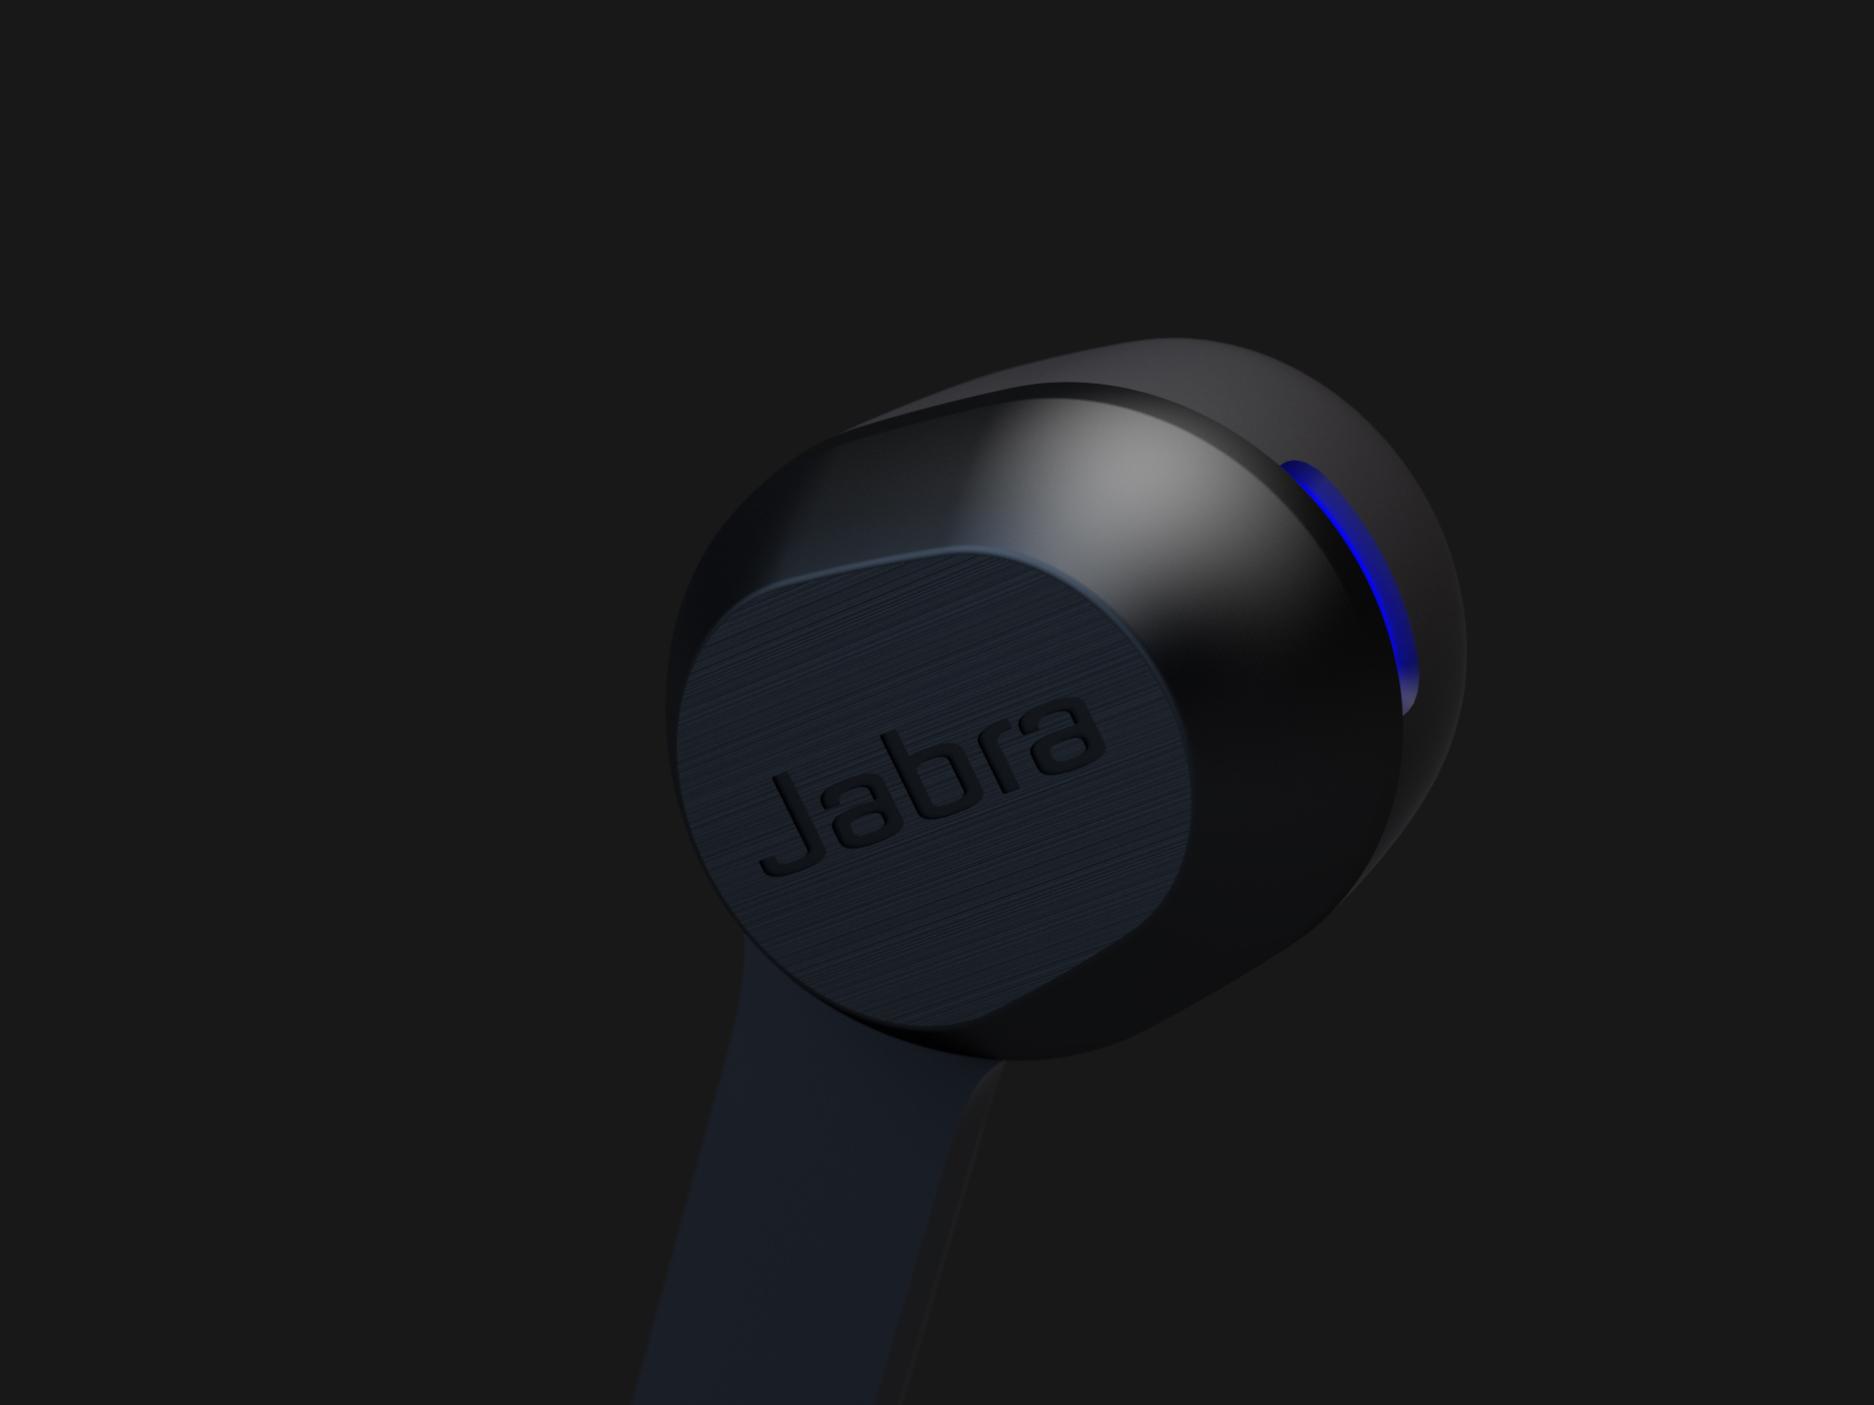 JABRA_Rox_2.jpg